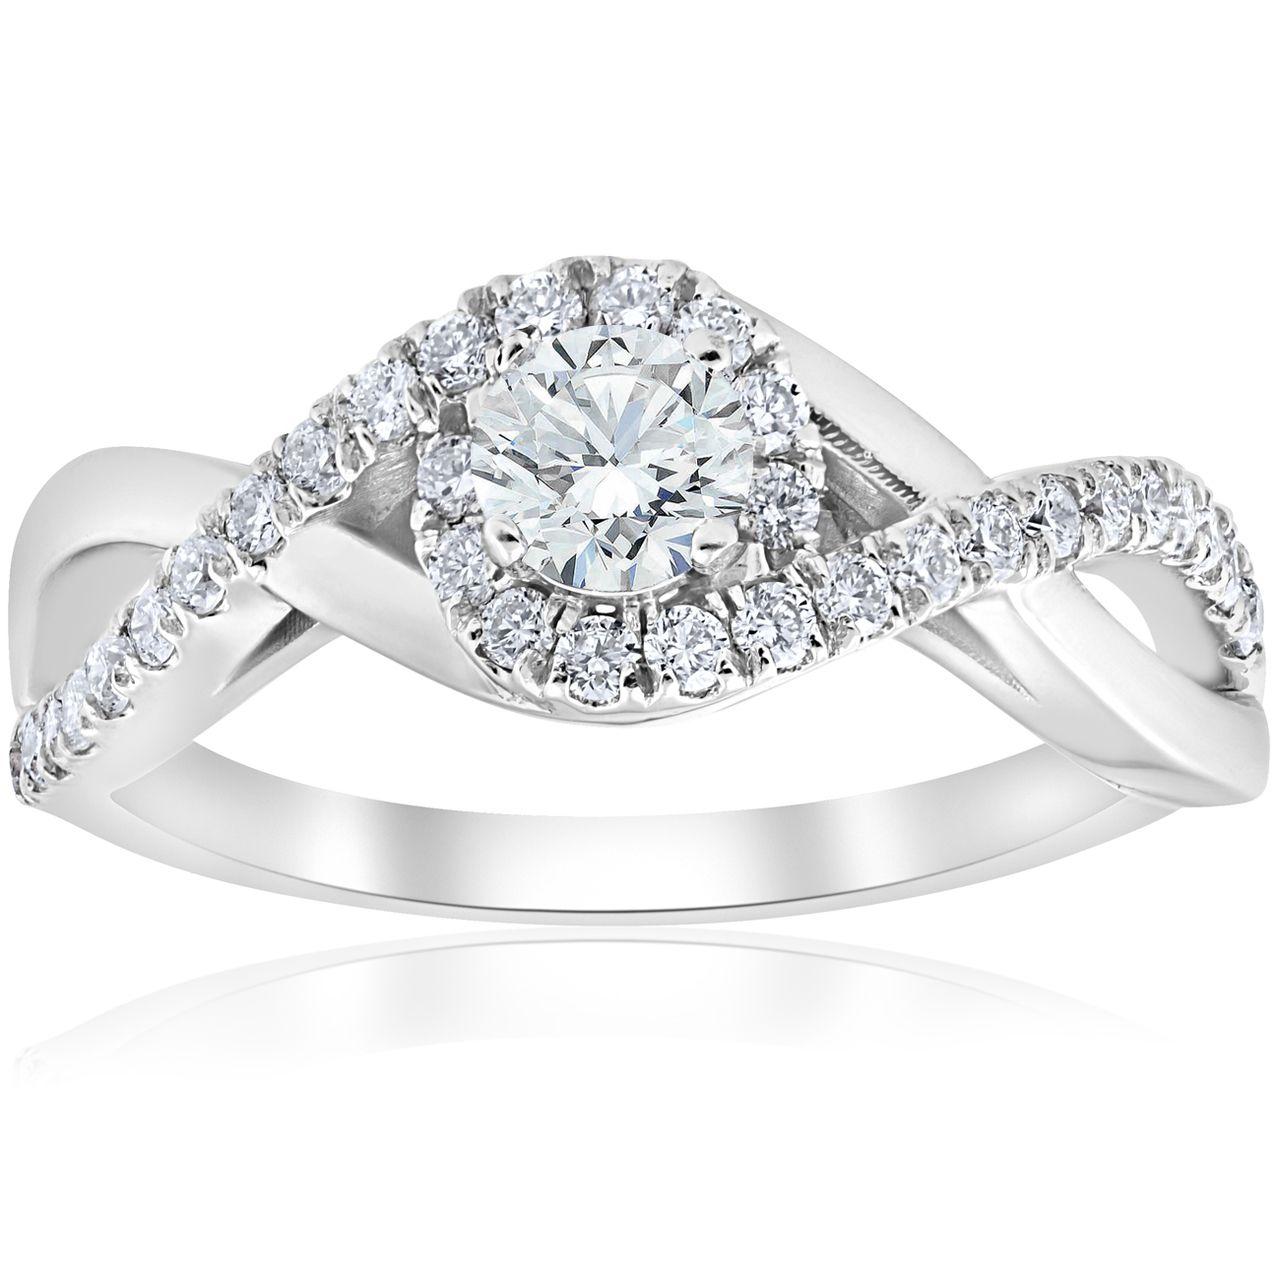 1 cttw Diamond Halo Infinity Engagement Ring 10k White